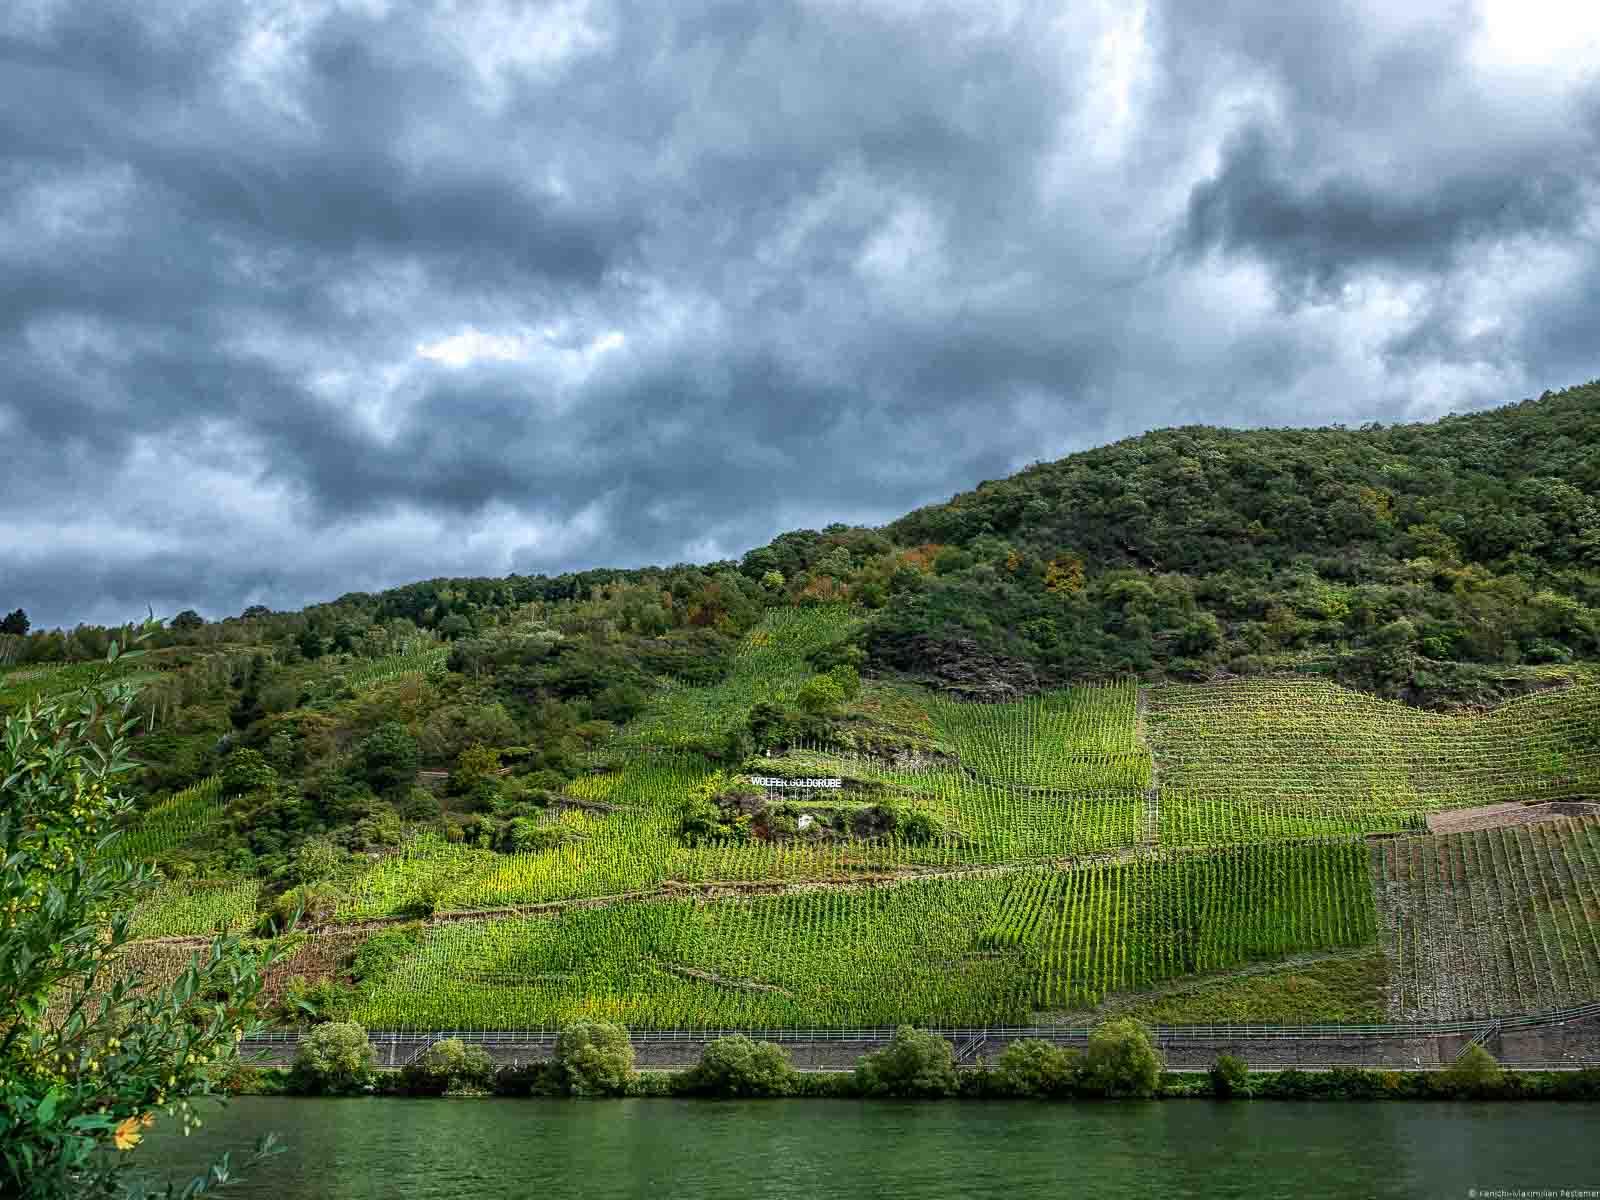 Fluss Mosel, steiler Weinberg Wolfer Goldgrube, Wolken